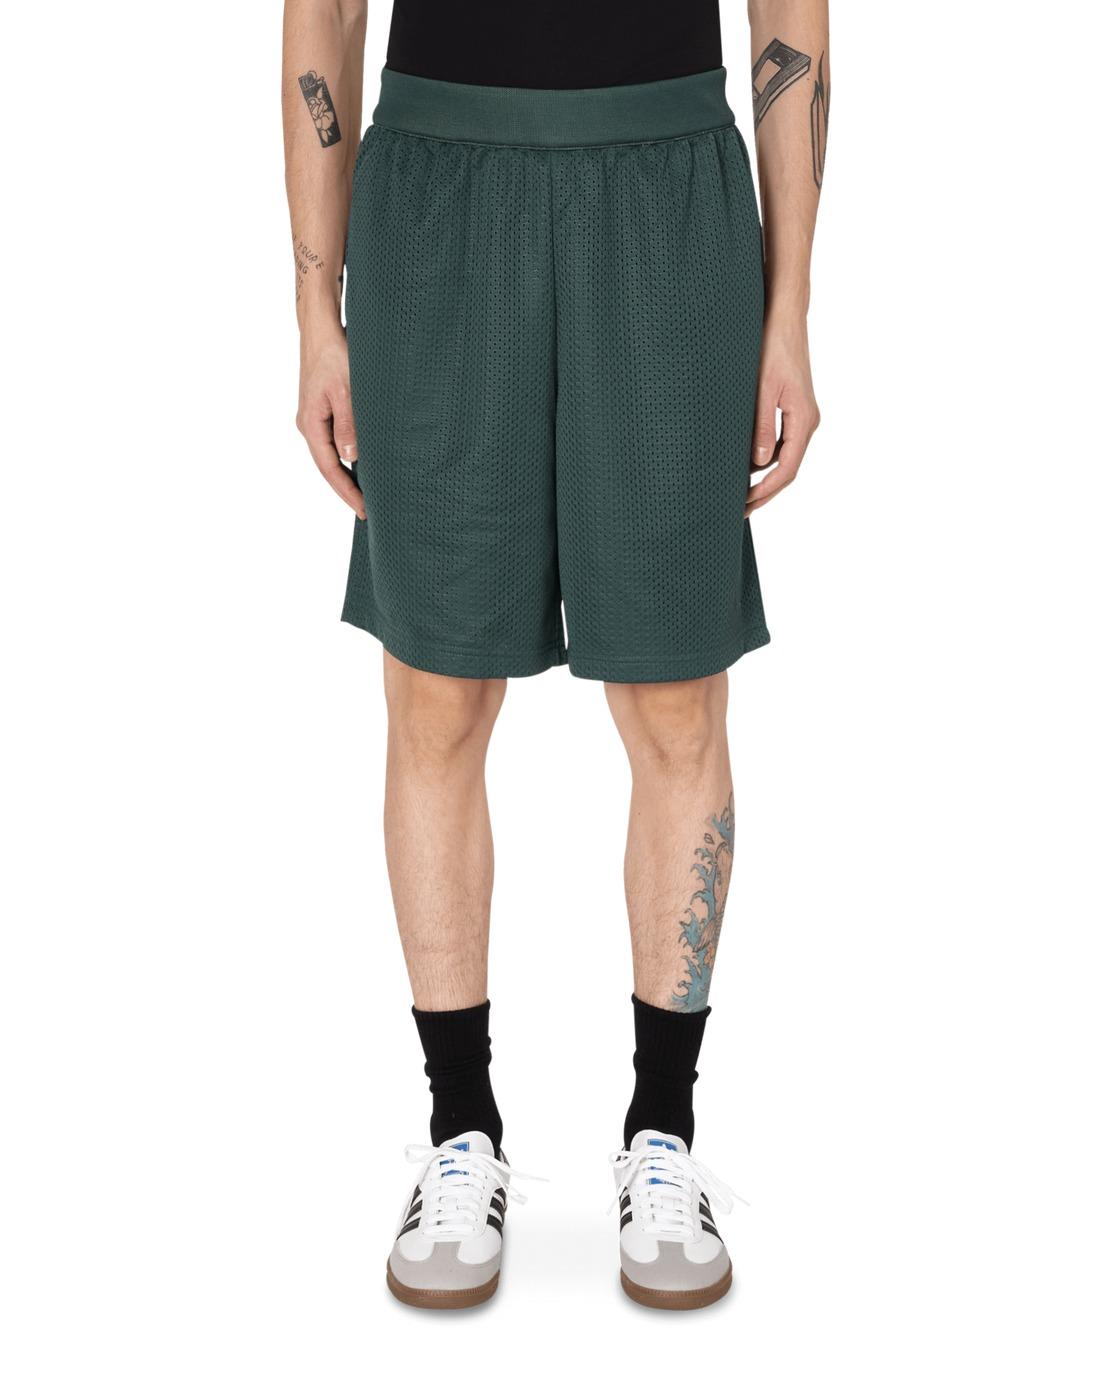 Adidas Originals Jonah Hill Mesh Shorts Mineral Green